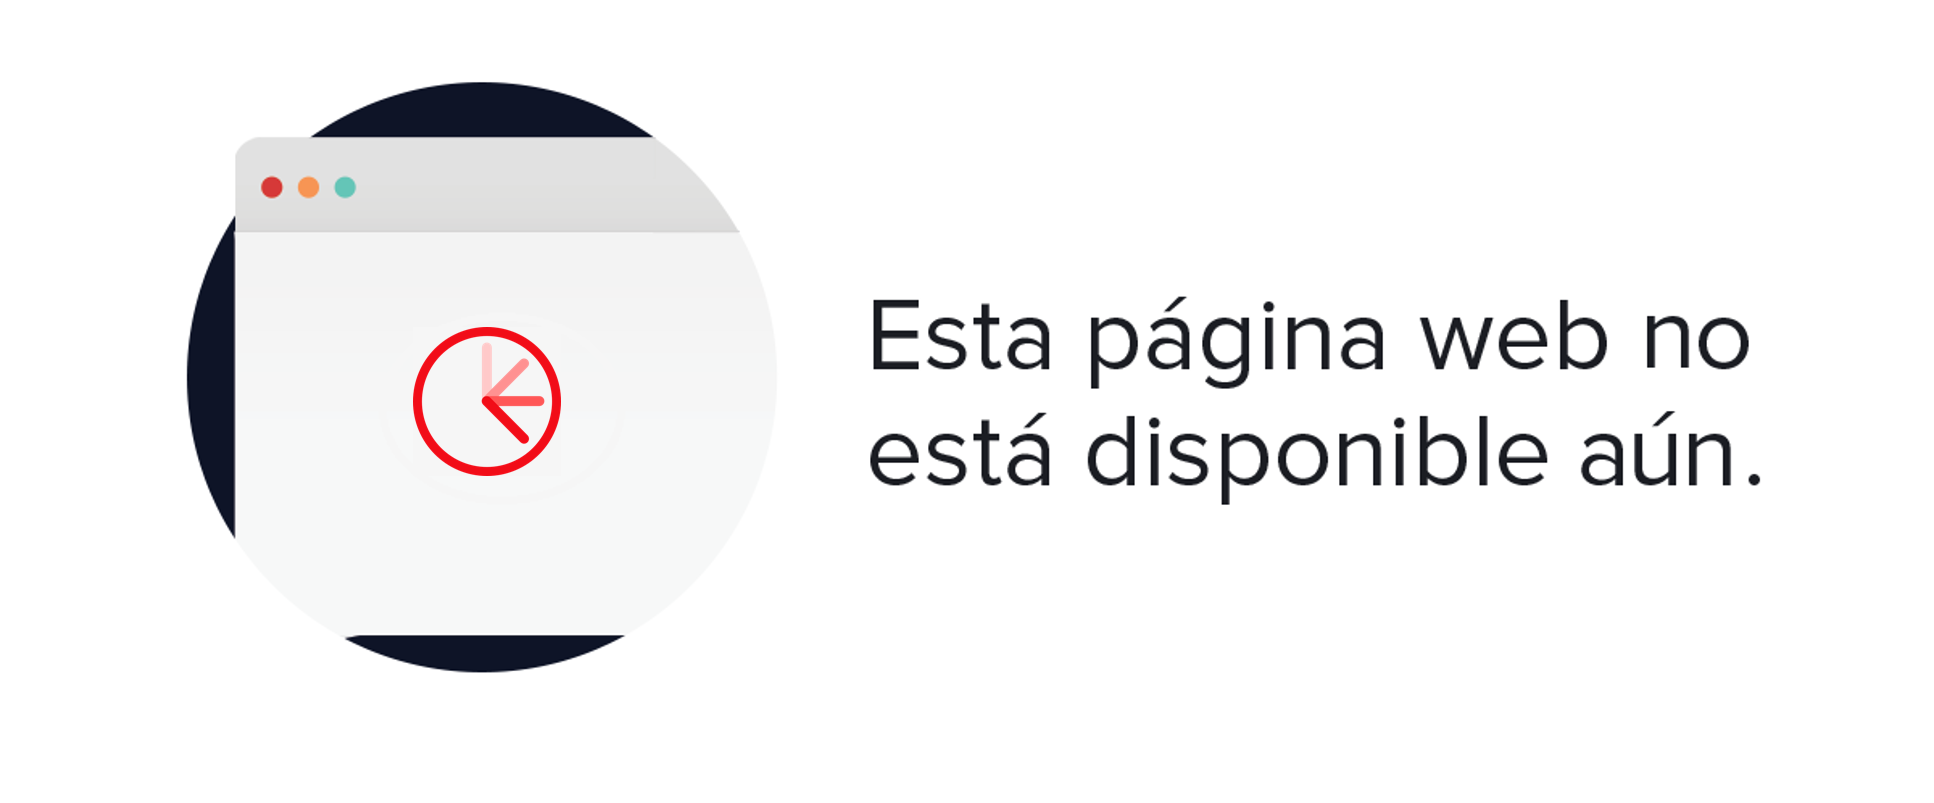 Camisa De los hombres Bloques Casual-Algodón-Manga Larga-Azul Blanco Gris 4829030-U256